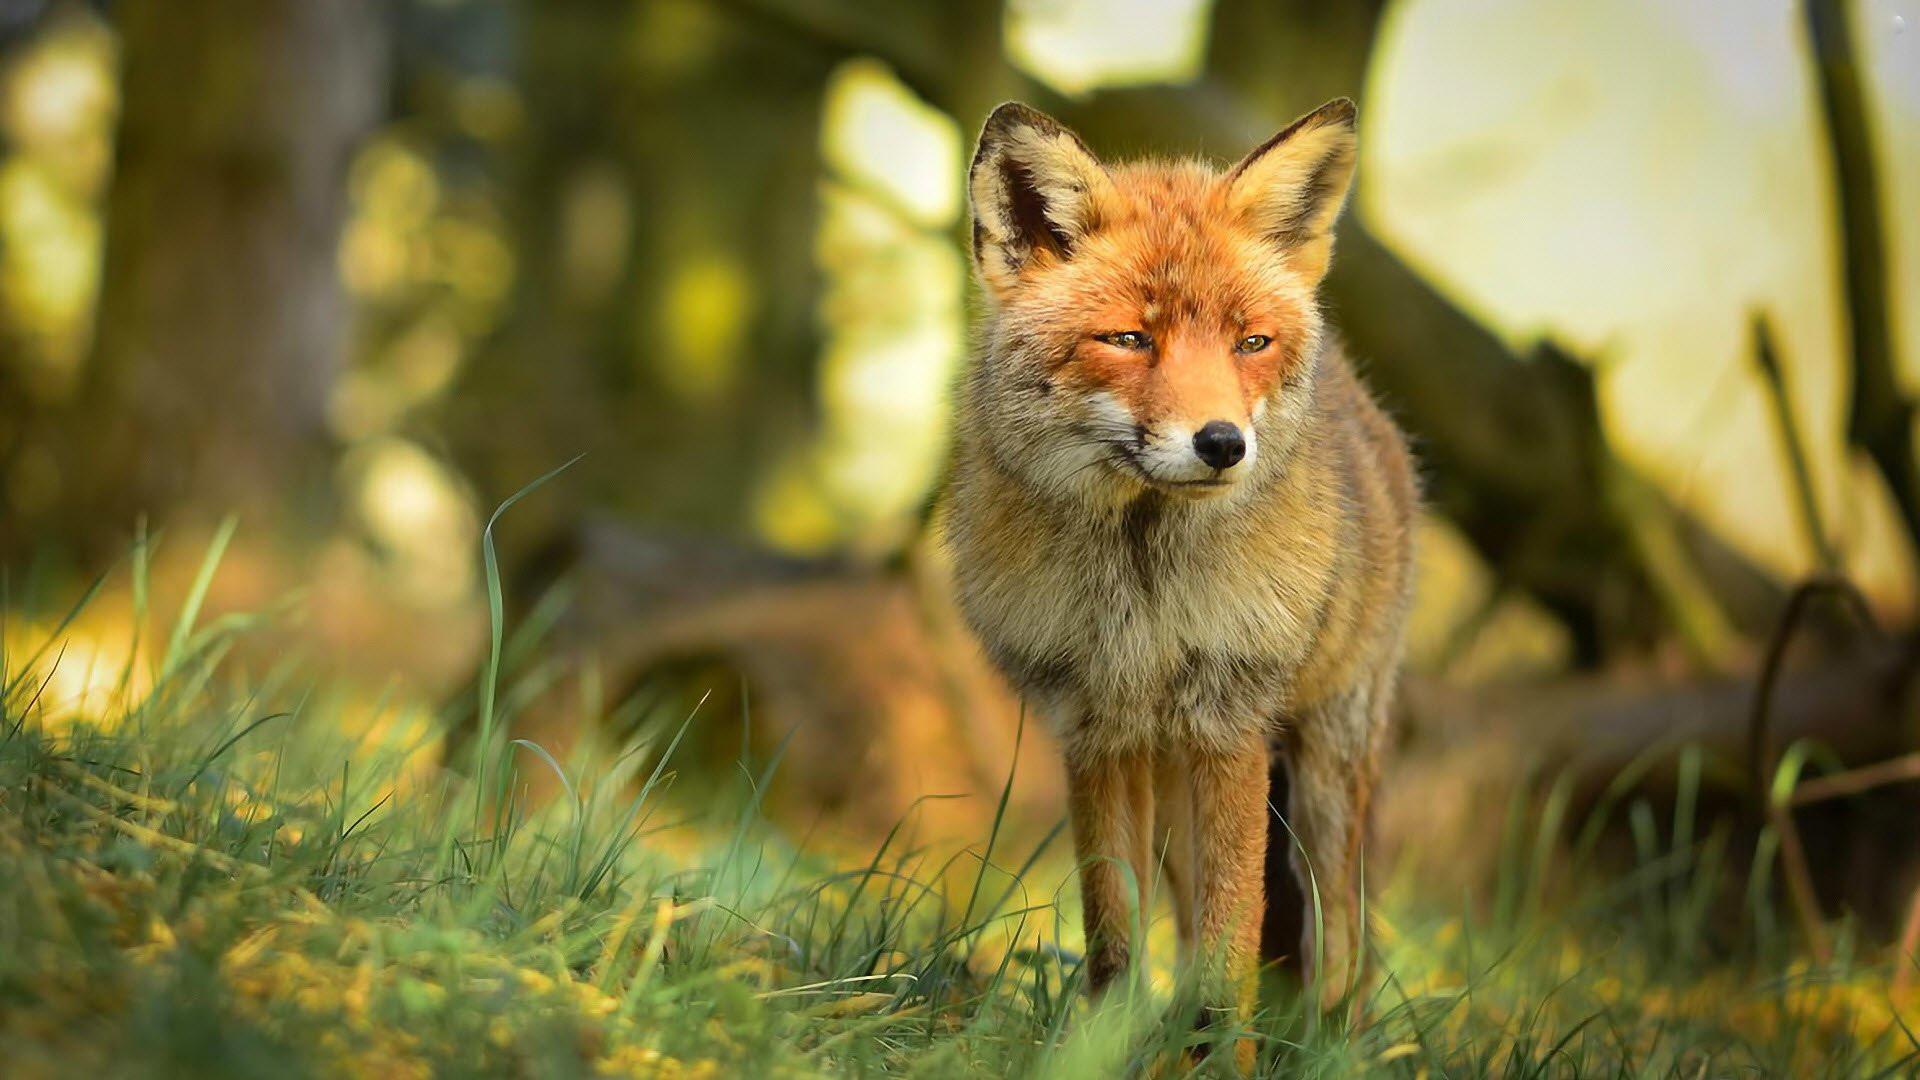 Cute red Fox wallpaper.